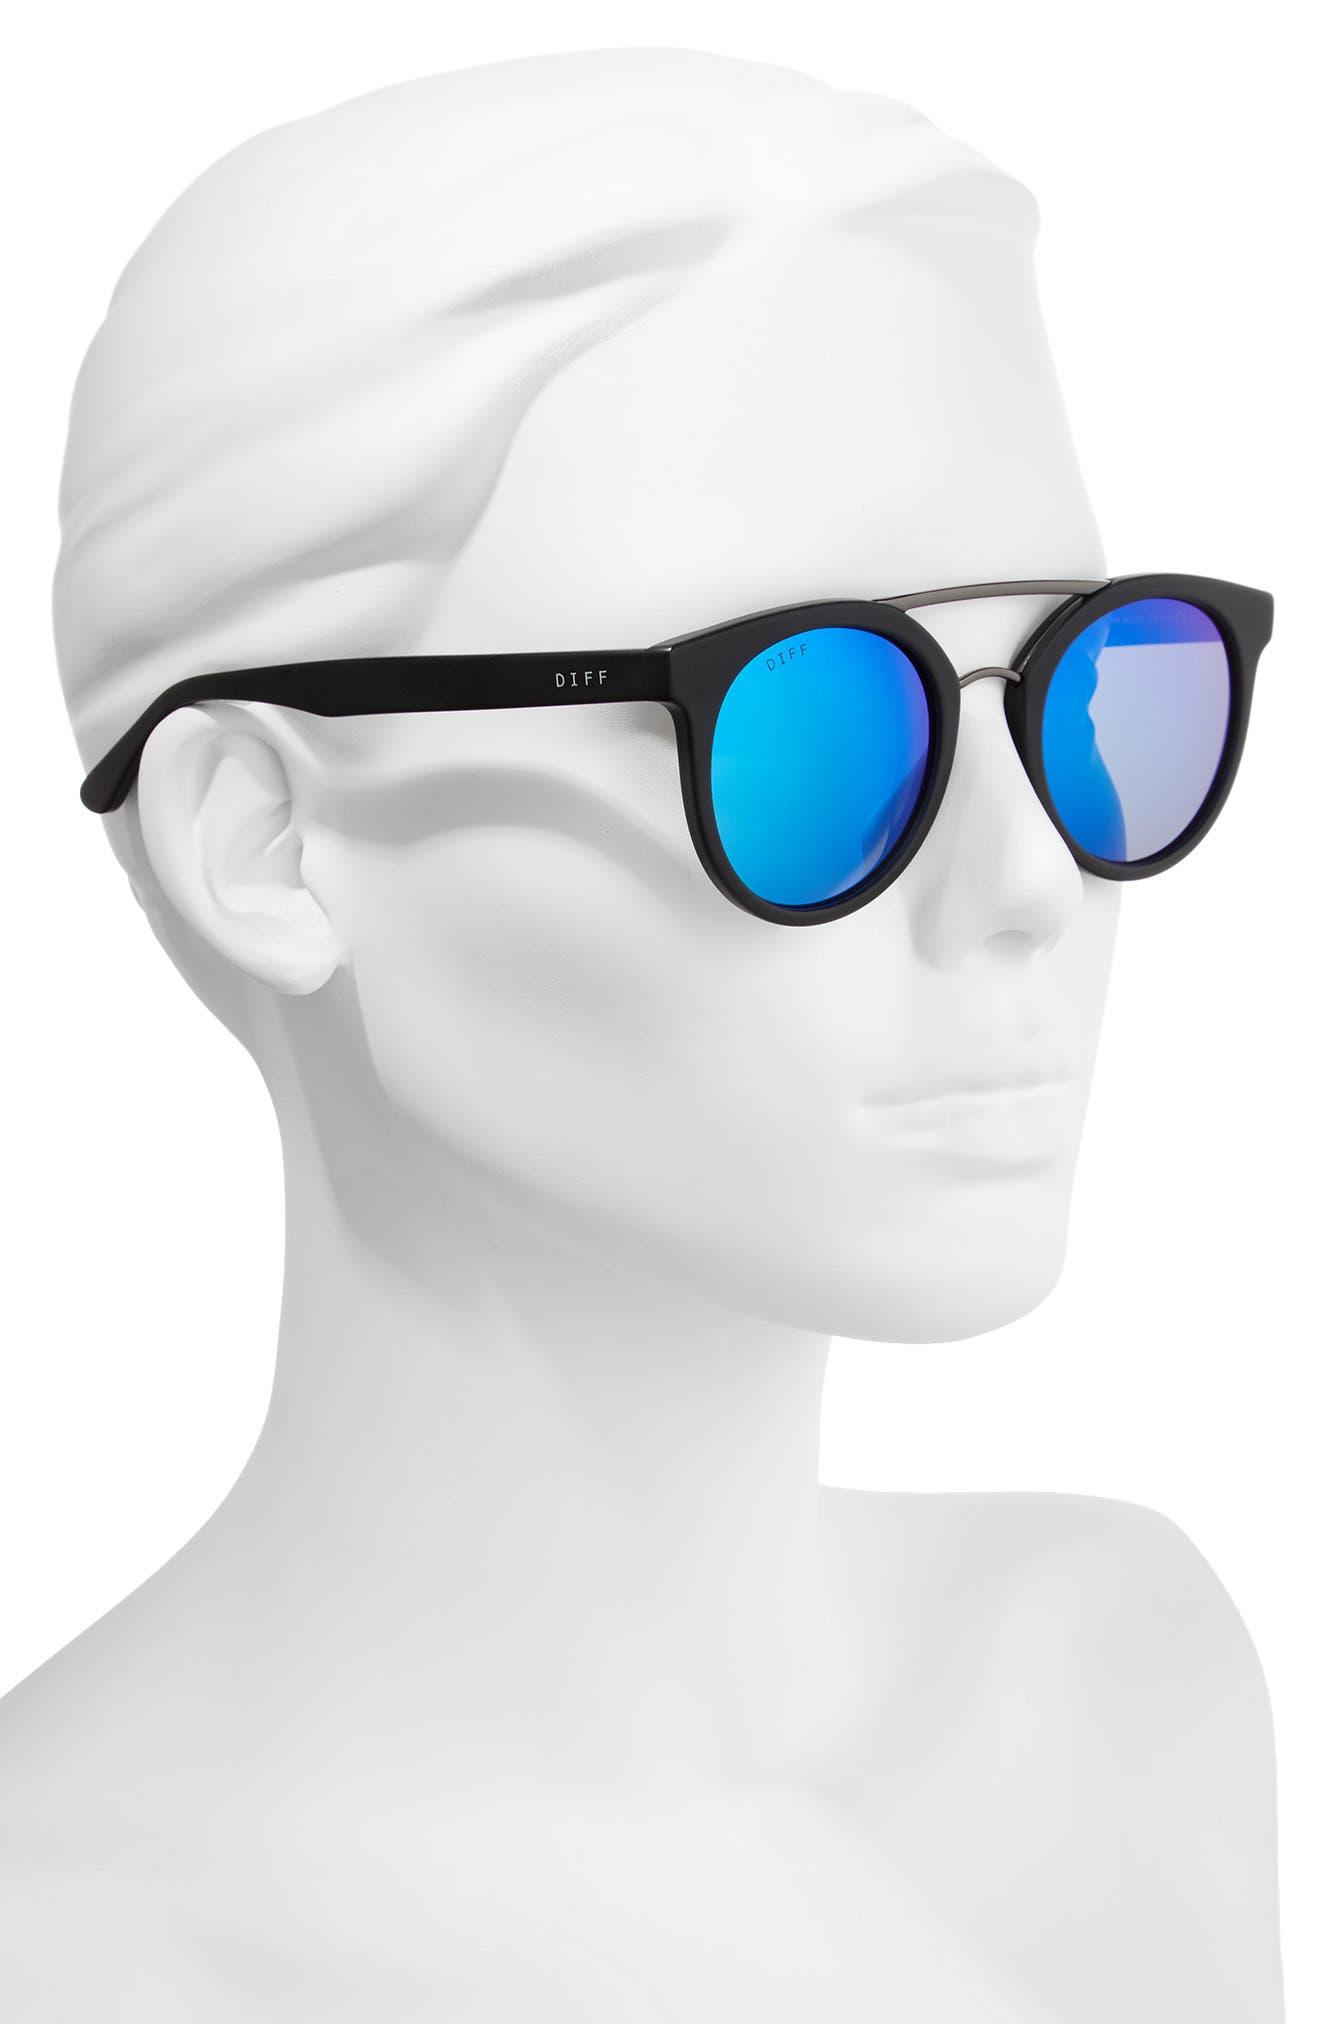 Astro 49mm Polarized Aviator Sunglasses,                             Alternate thumbnail 2, color,                             004